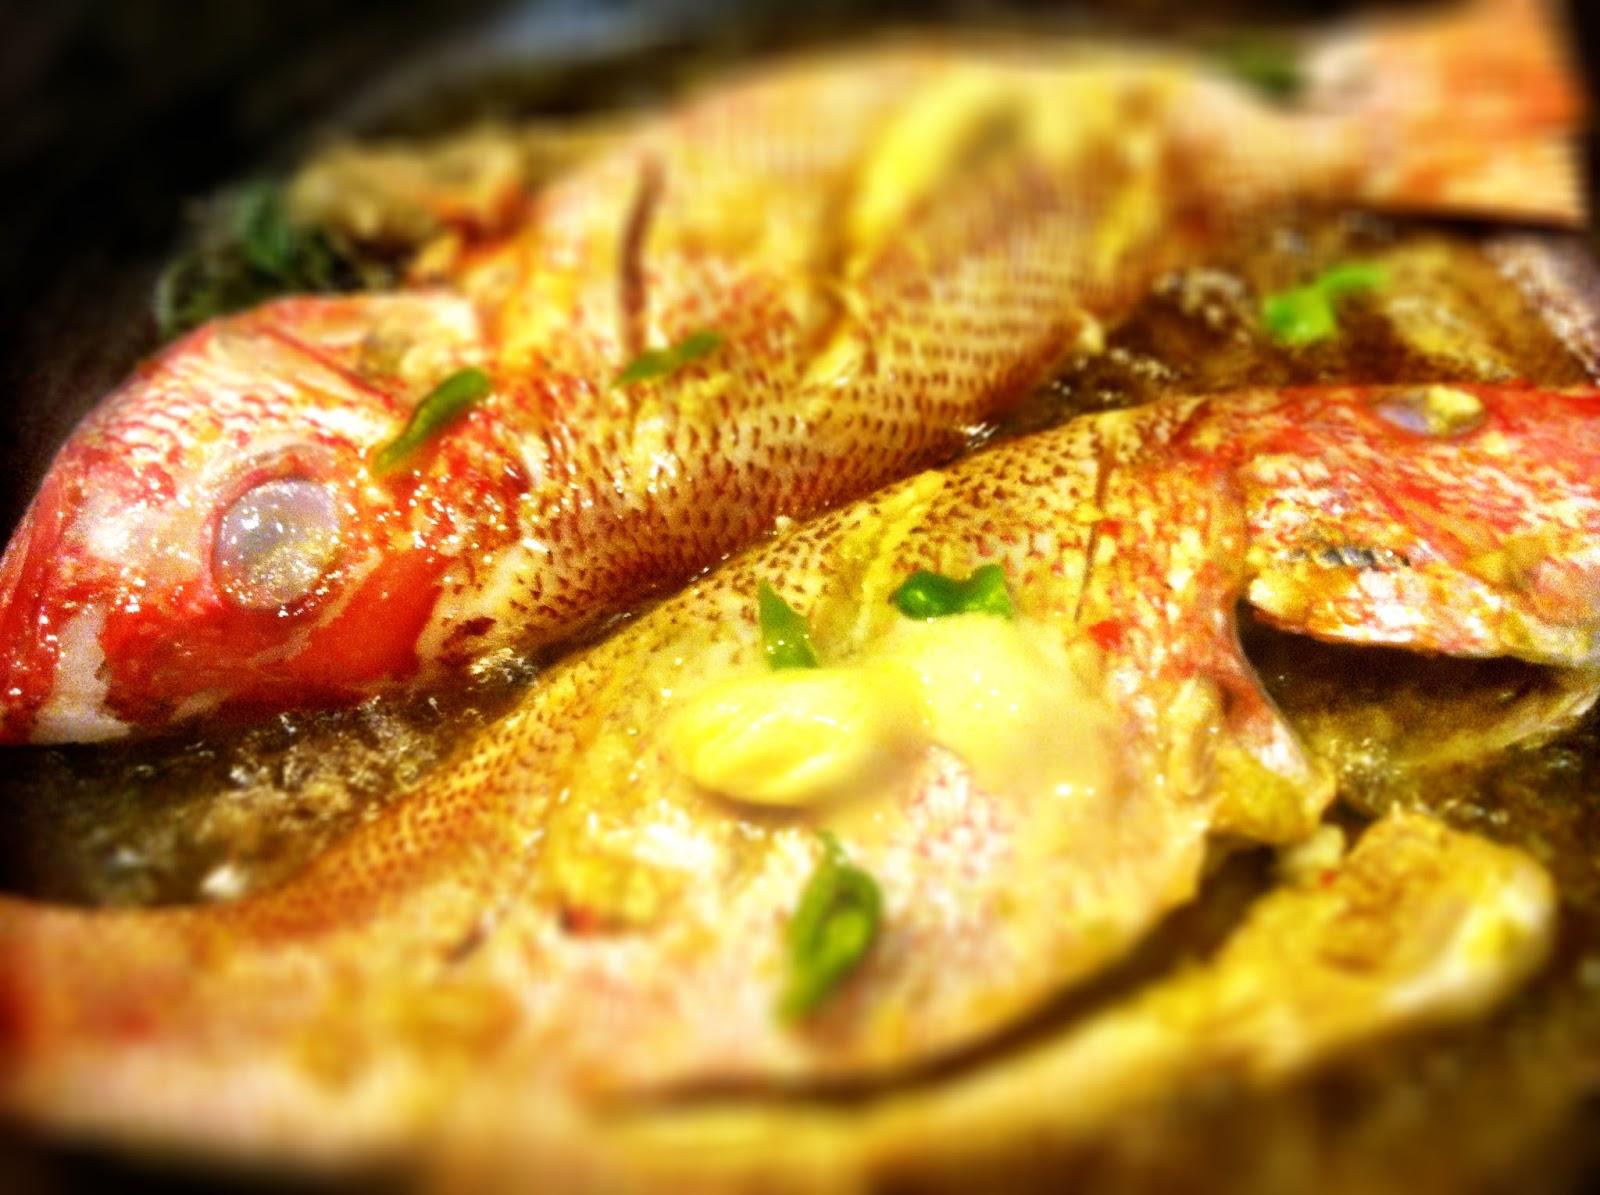 Poisson au gros sel l 39 haitienne haitian fish recipe for Cuisine haitienne